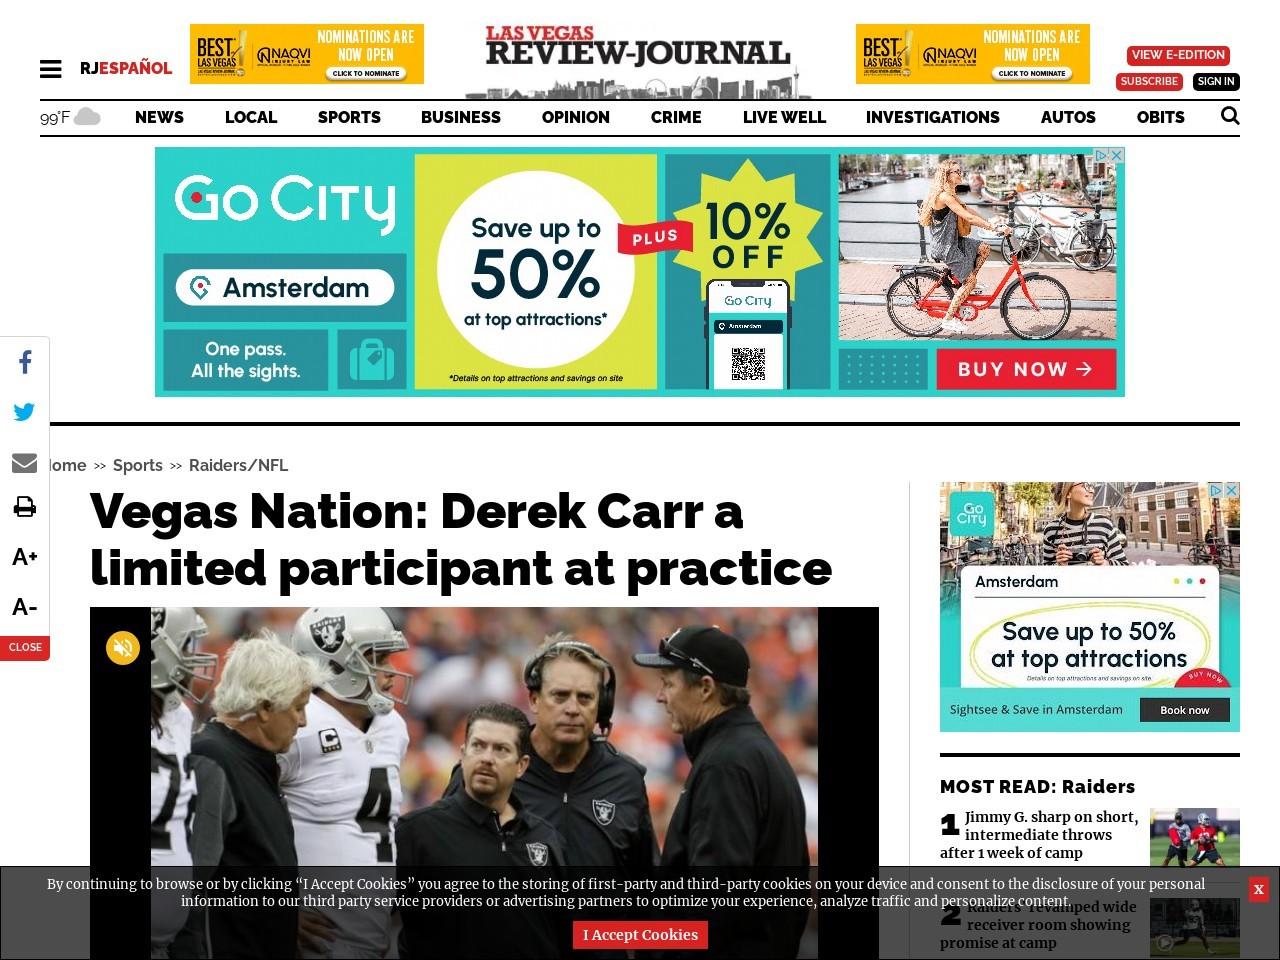 Vegas Nation: Derek Carr a limited participant at practice